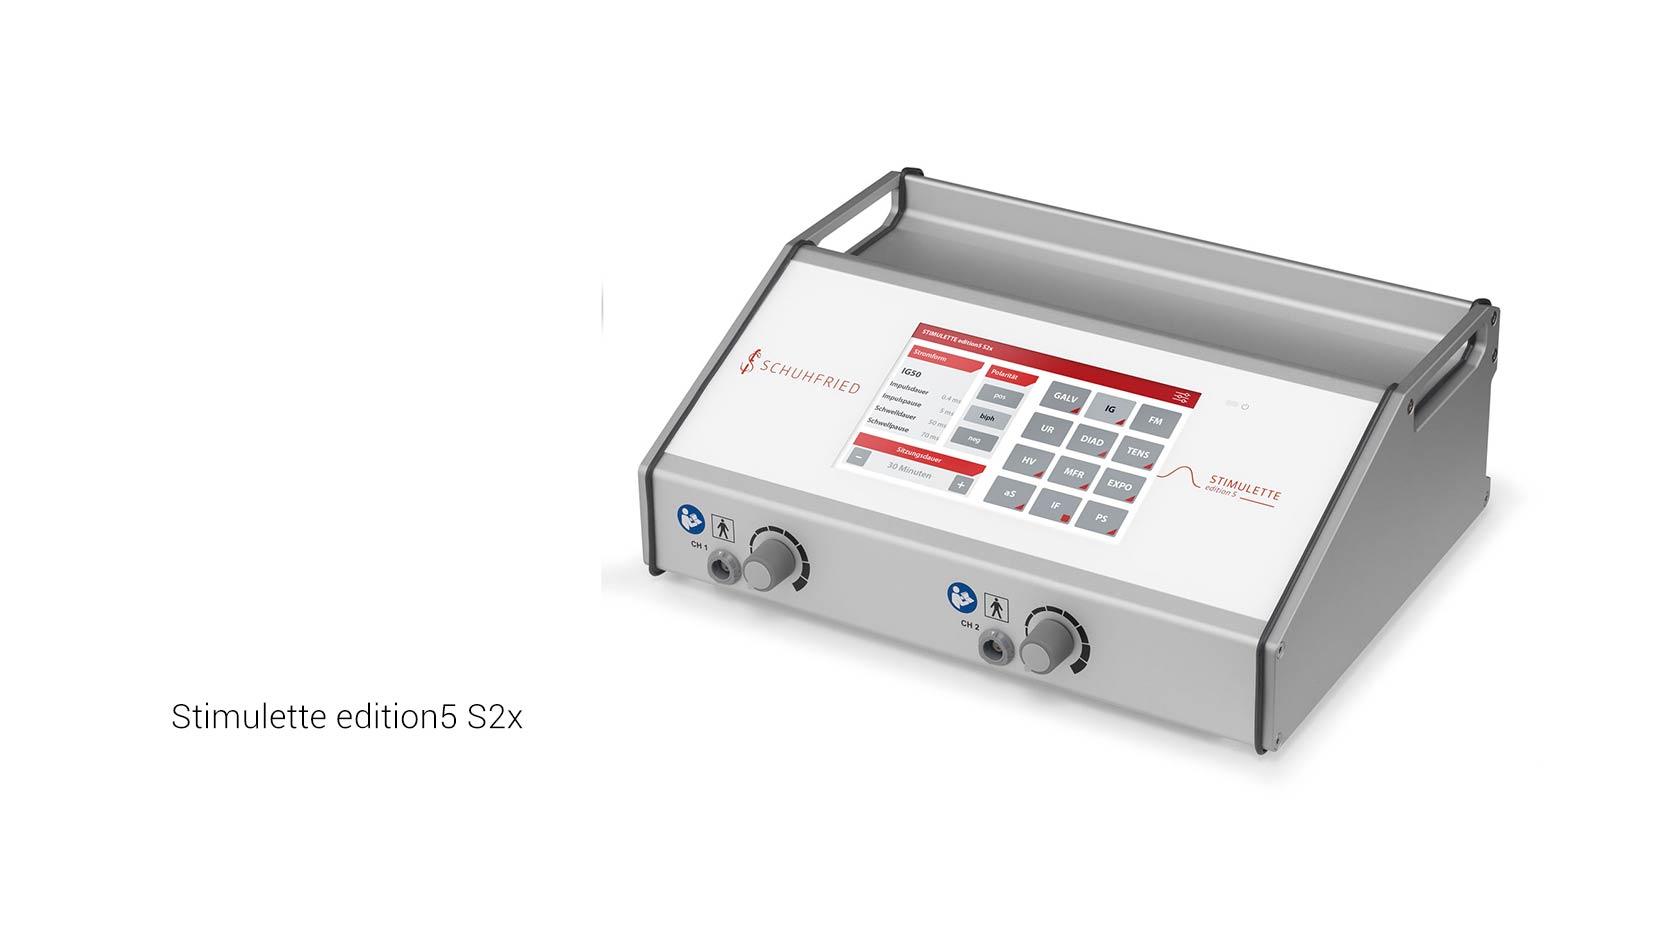 Stimulette-Elektrotherapie-edition5-S2x